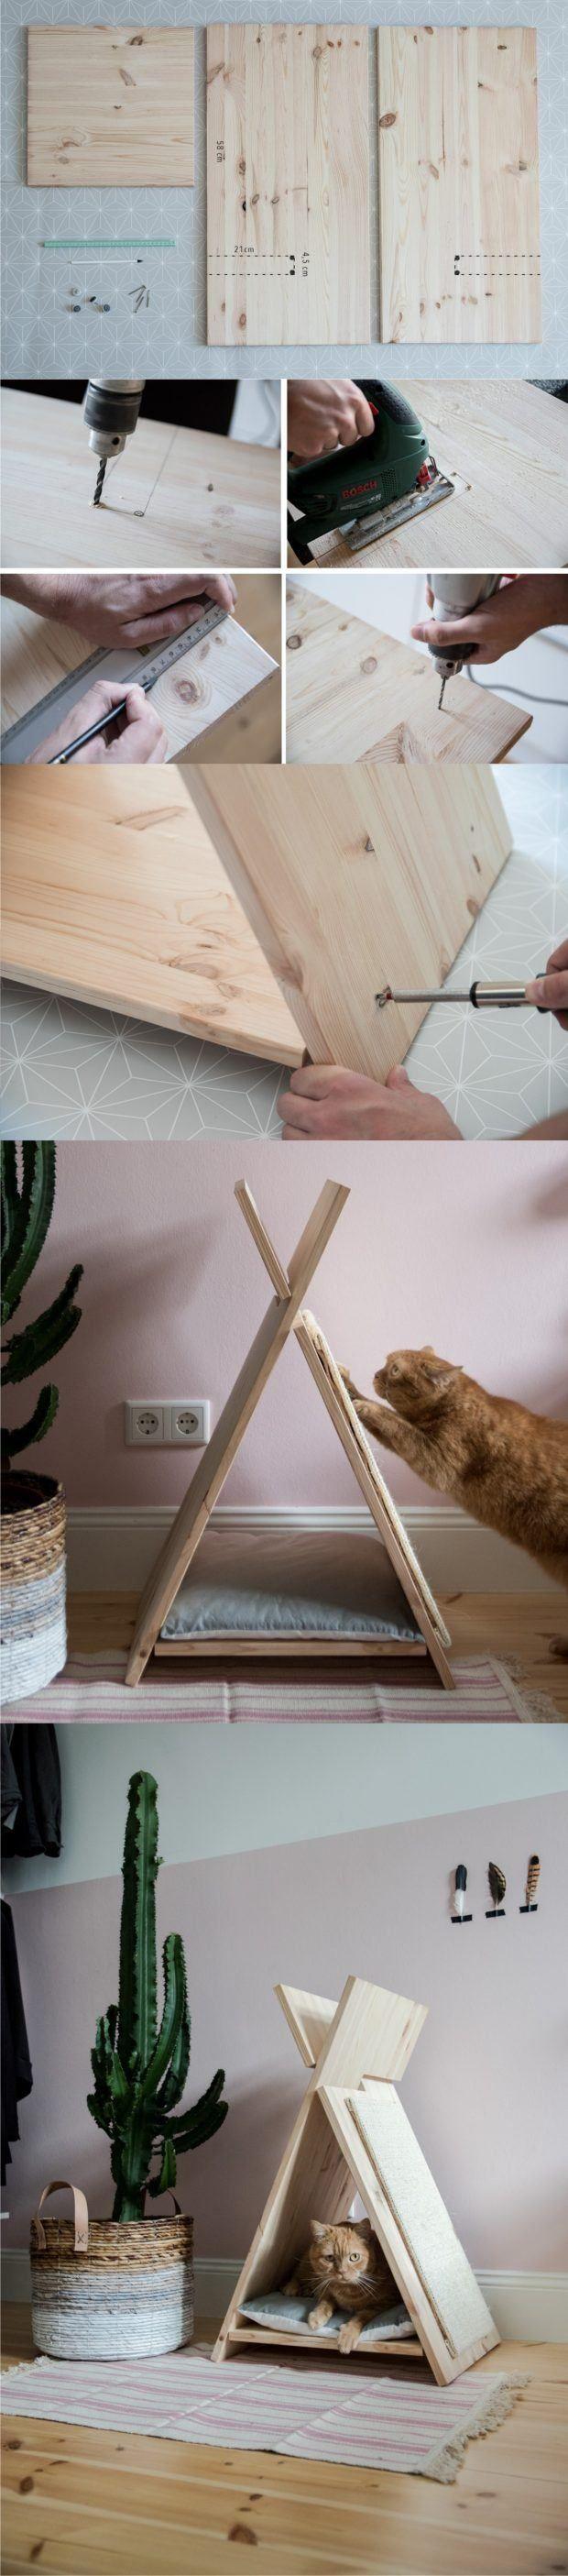 tipi-gato-diy-muy-ingenioso-2